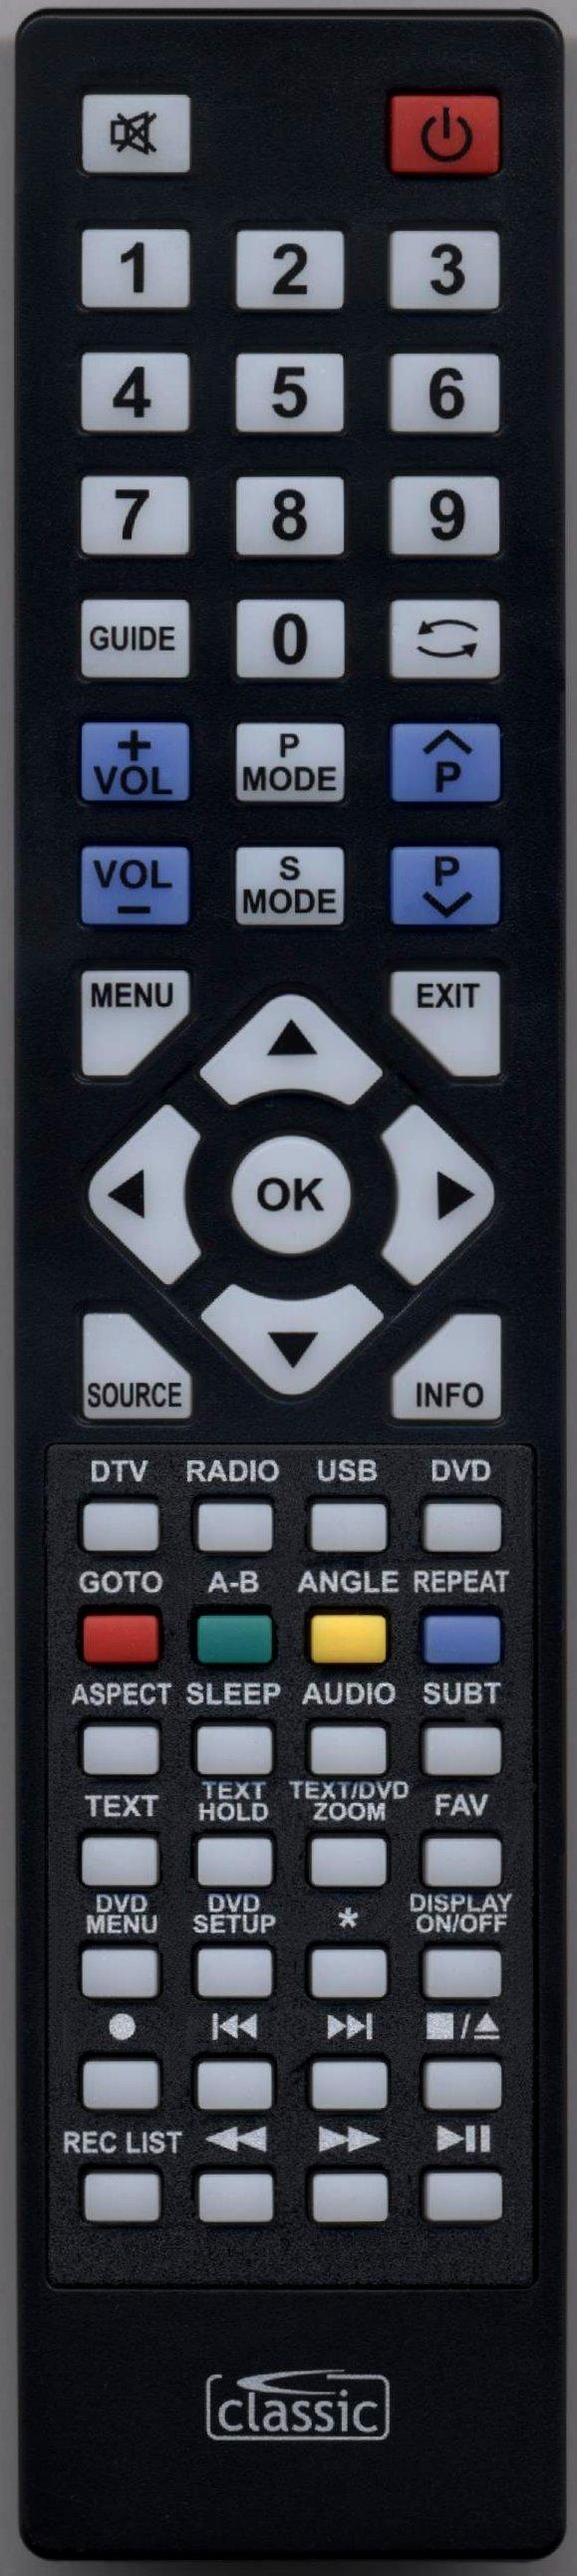 BLAUPUNKT 43/134O-GB-11B-FEGP-UK Remote Control